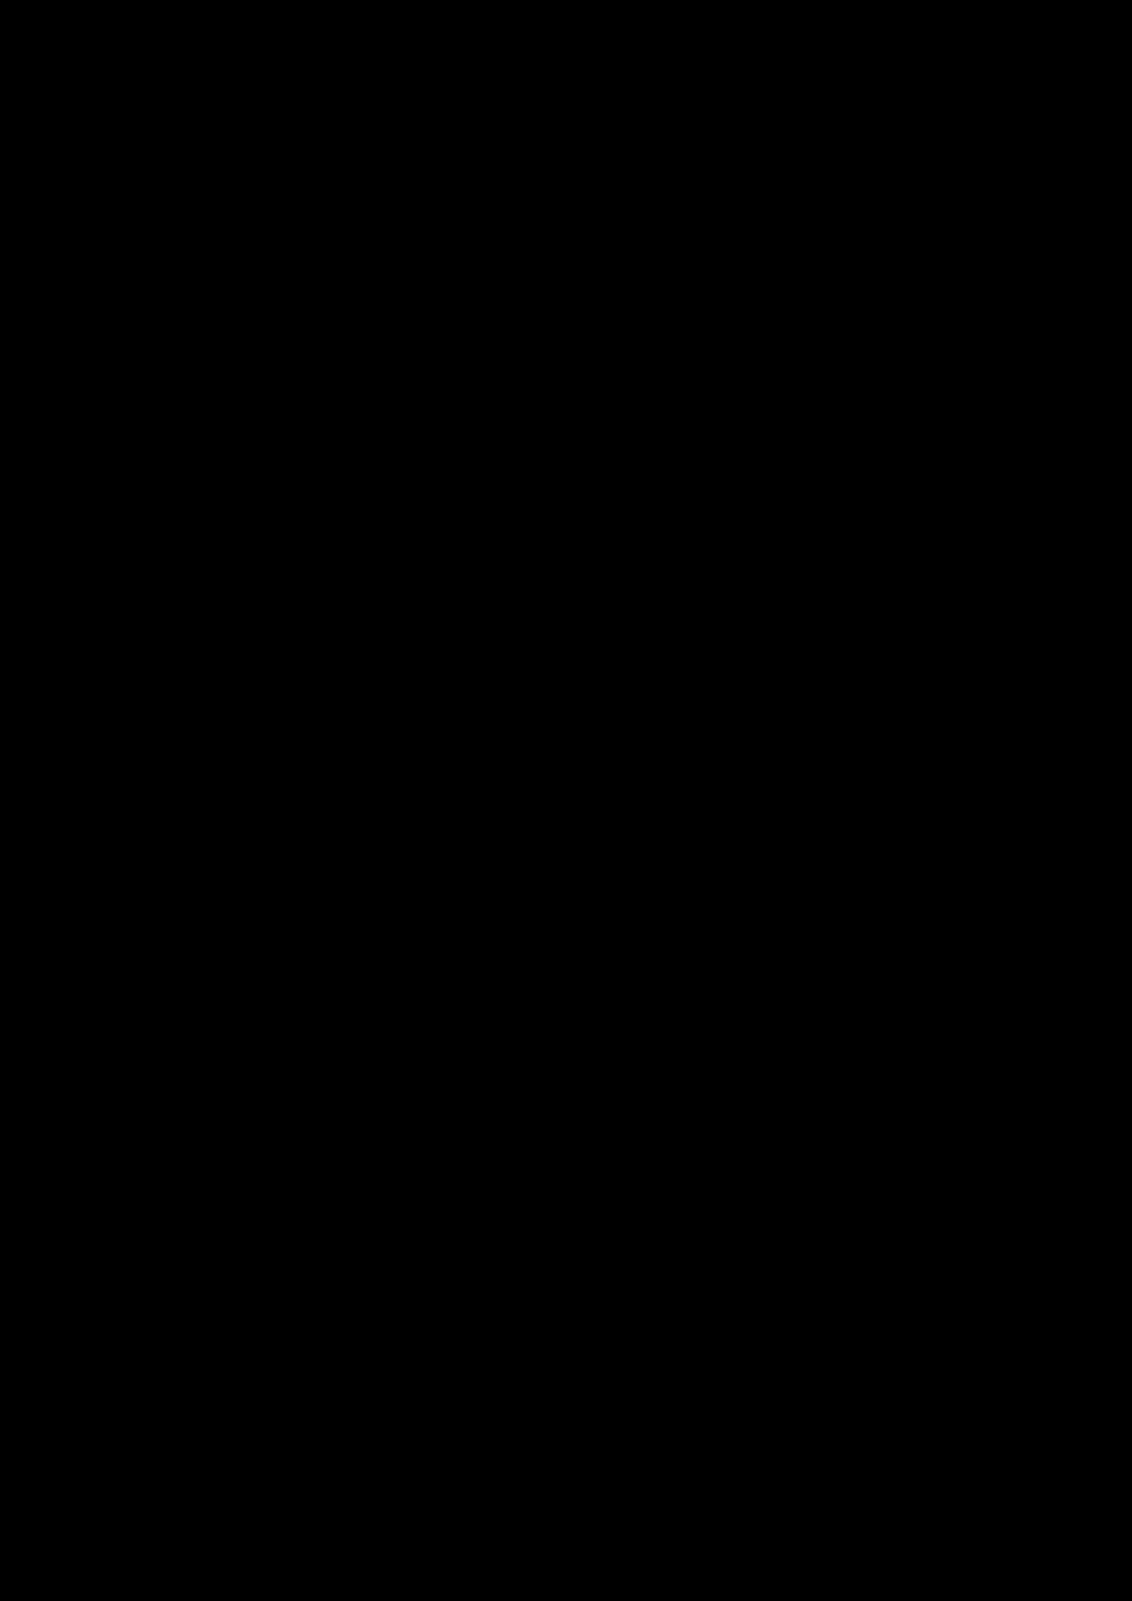 Belyiy sokol slide, Image 104